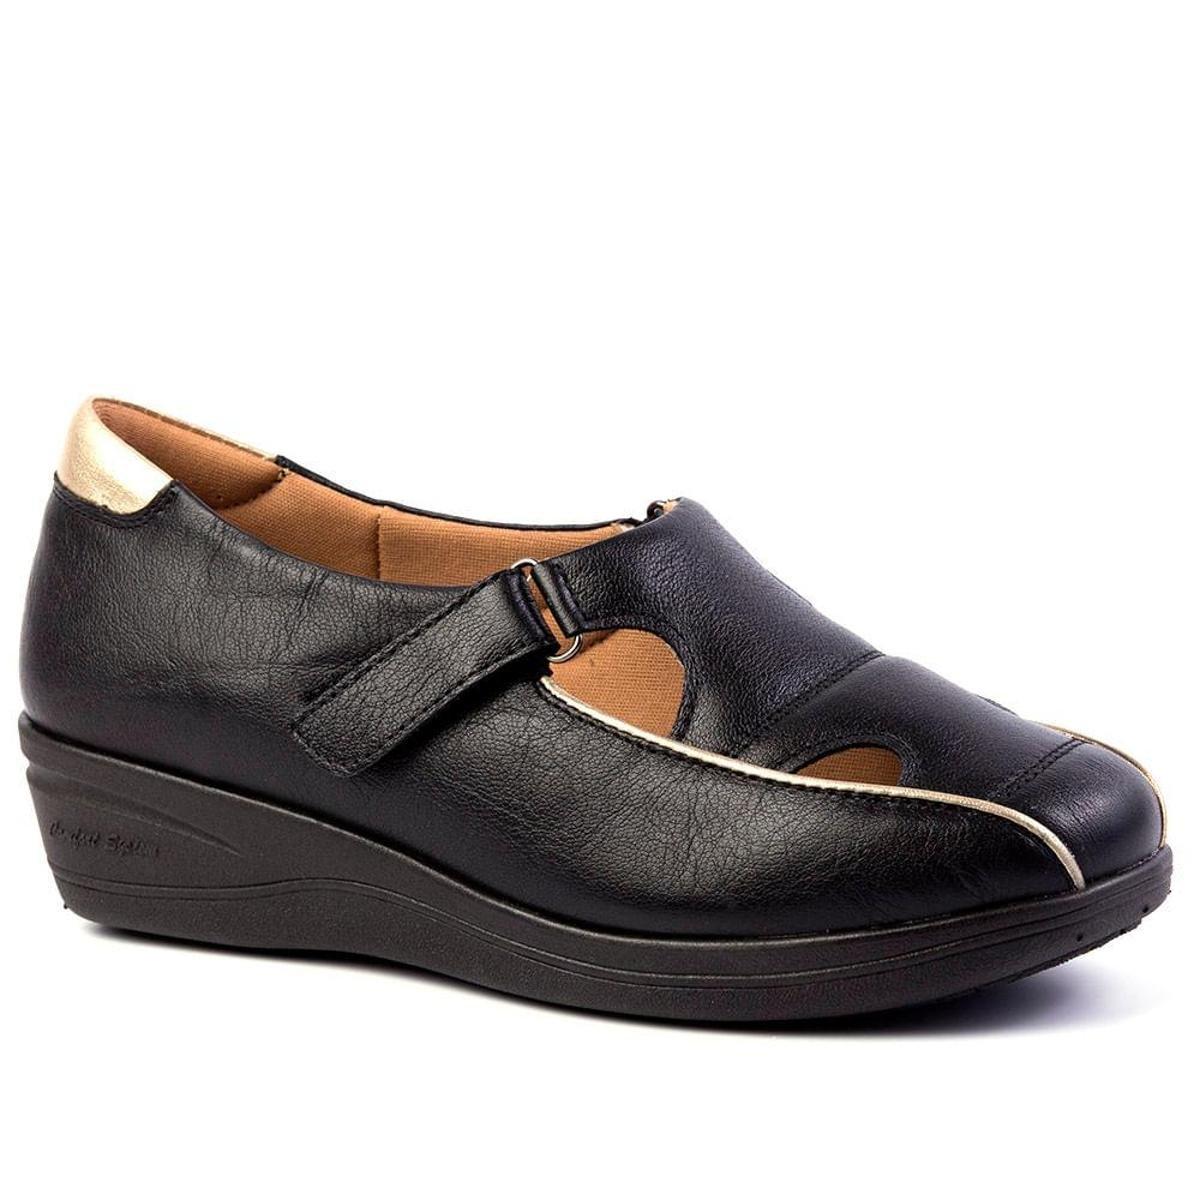 Sapato Couro Anabela Doctor em 185 Preto Sapato Feminino Shoes Feminino 15YSq0